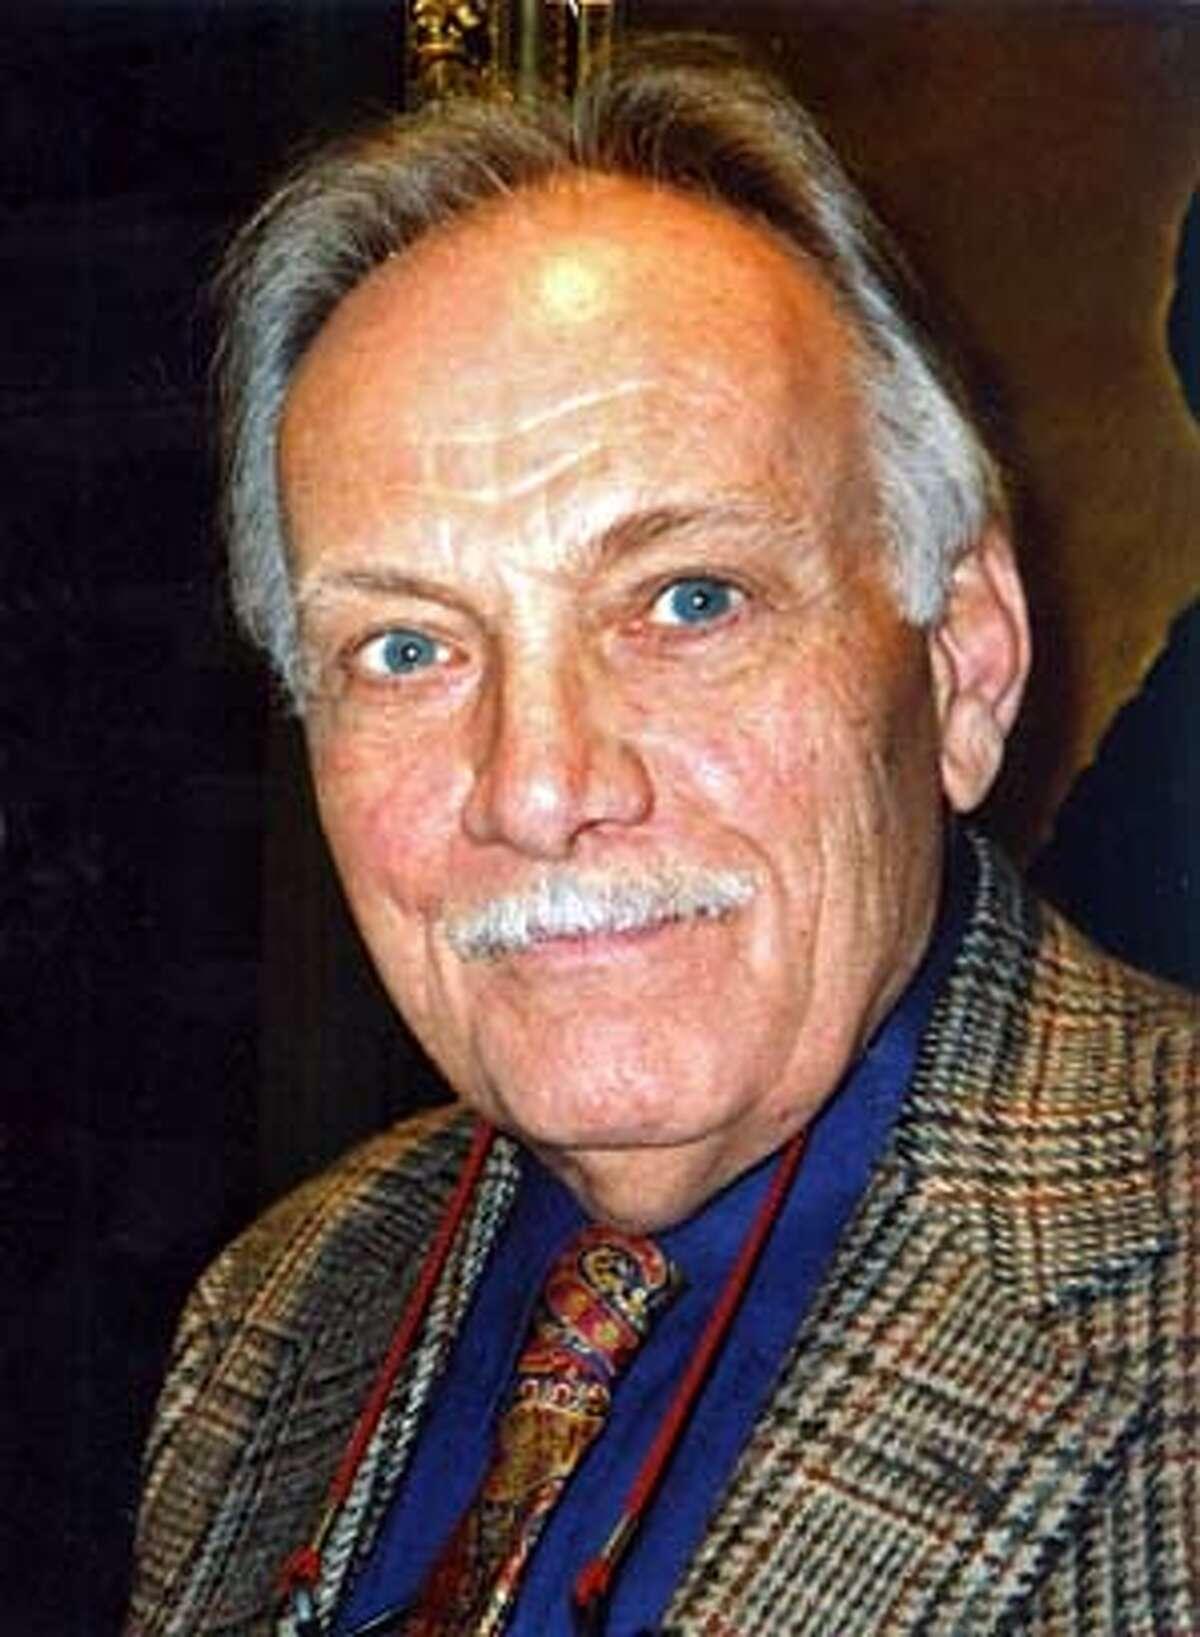 Obituary photo of F. Clark Howell.